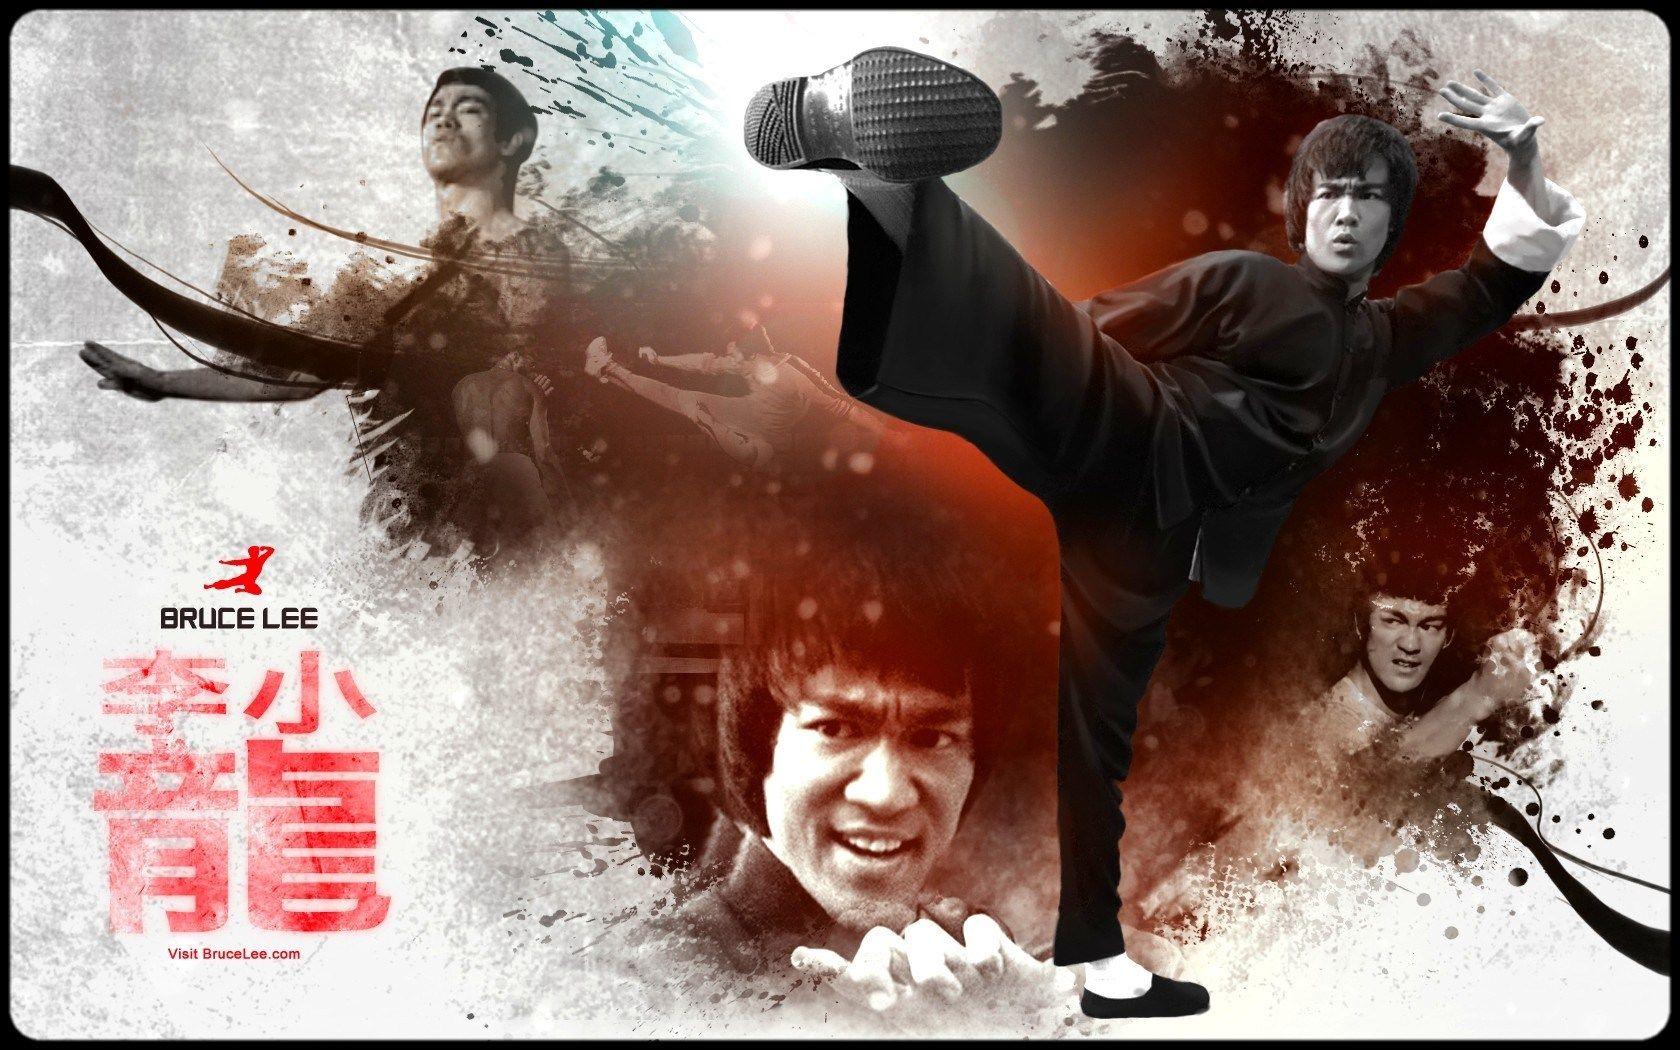 1680x1050 High Resolution Wallpaper Martial Arts Bruce Lee Bruce Lee Art Bruce Lee Photos